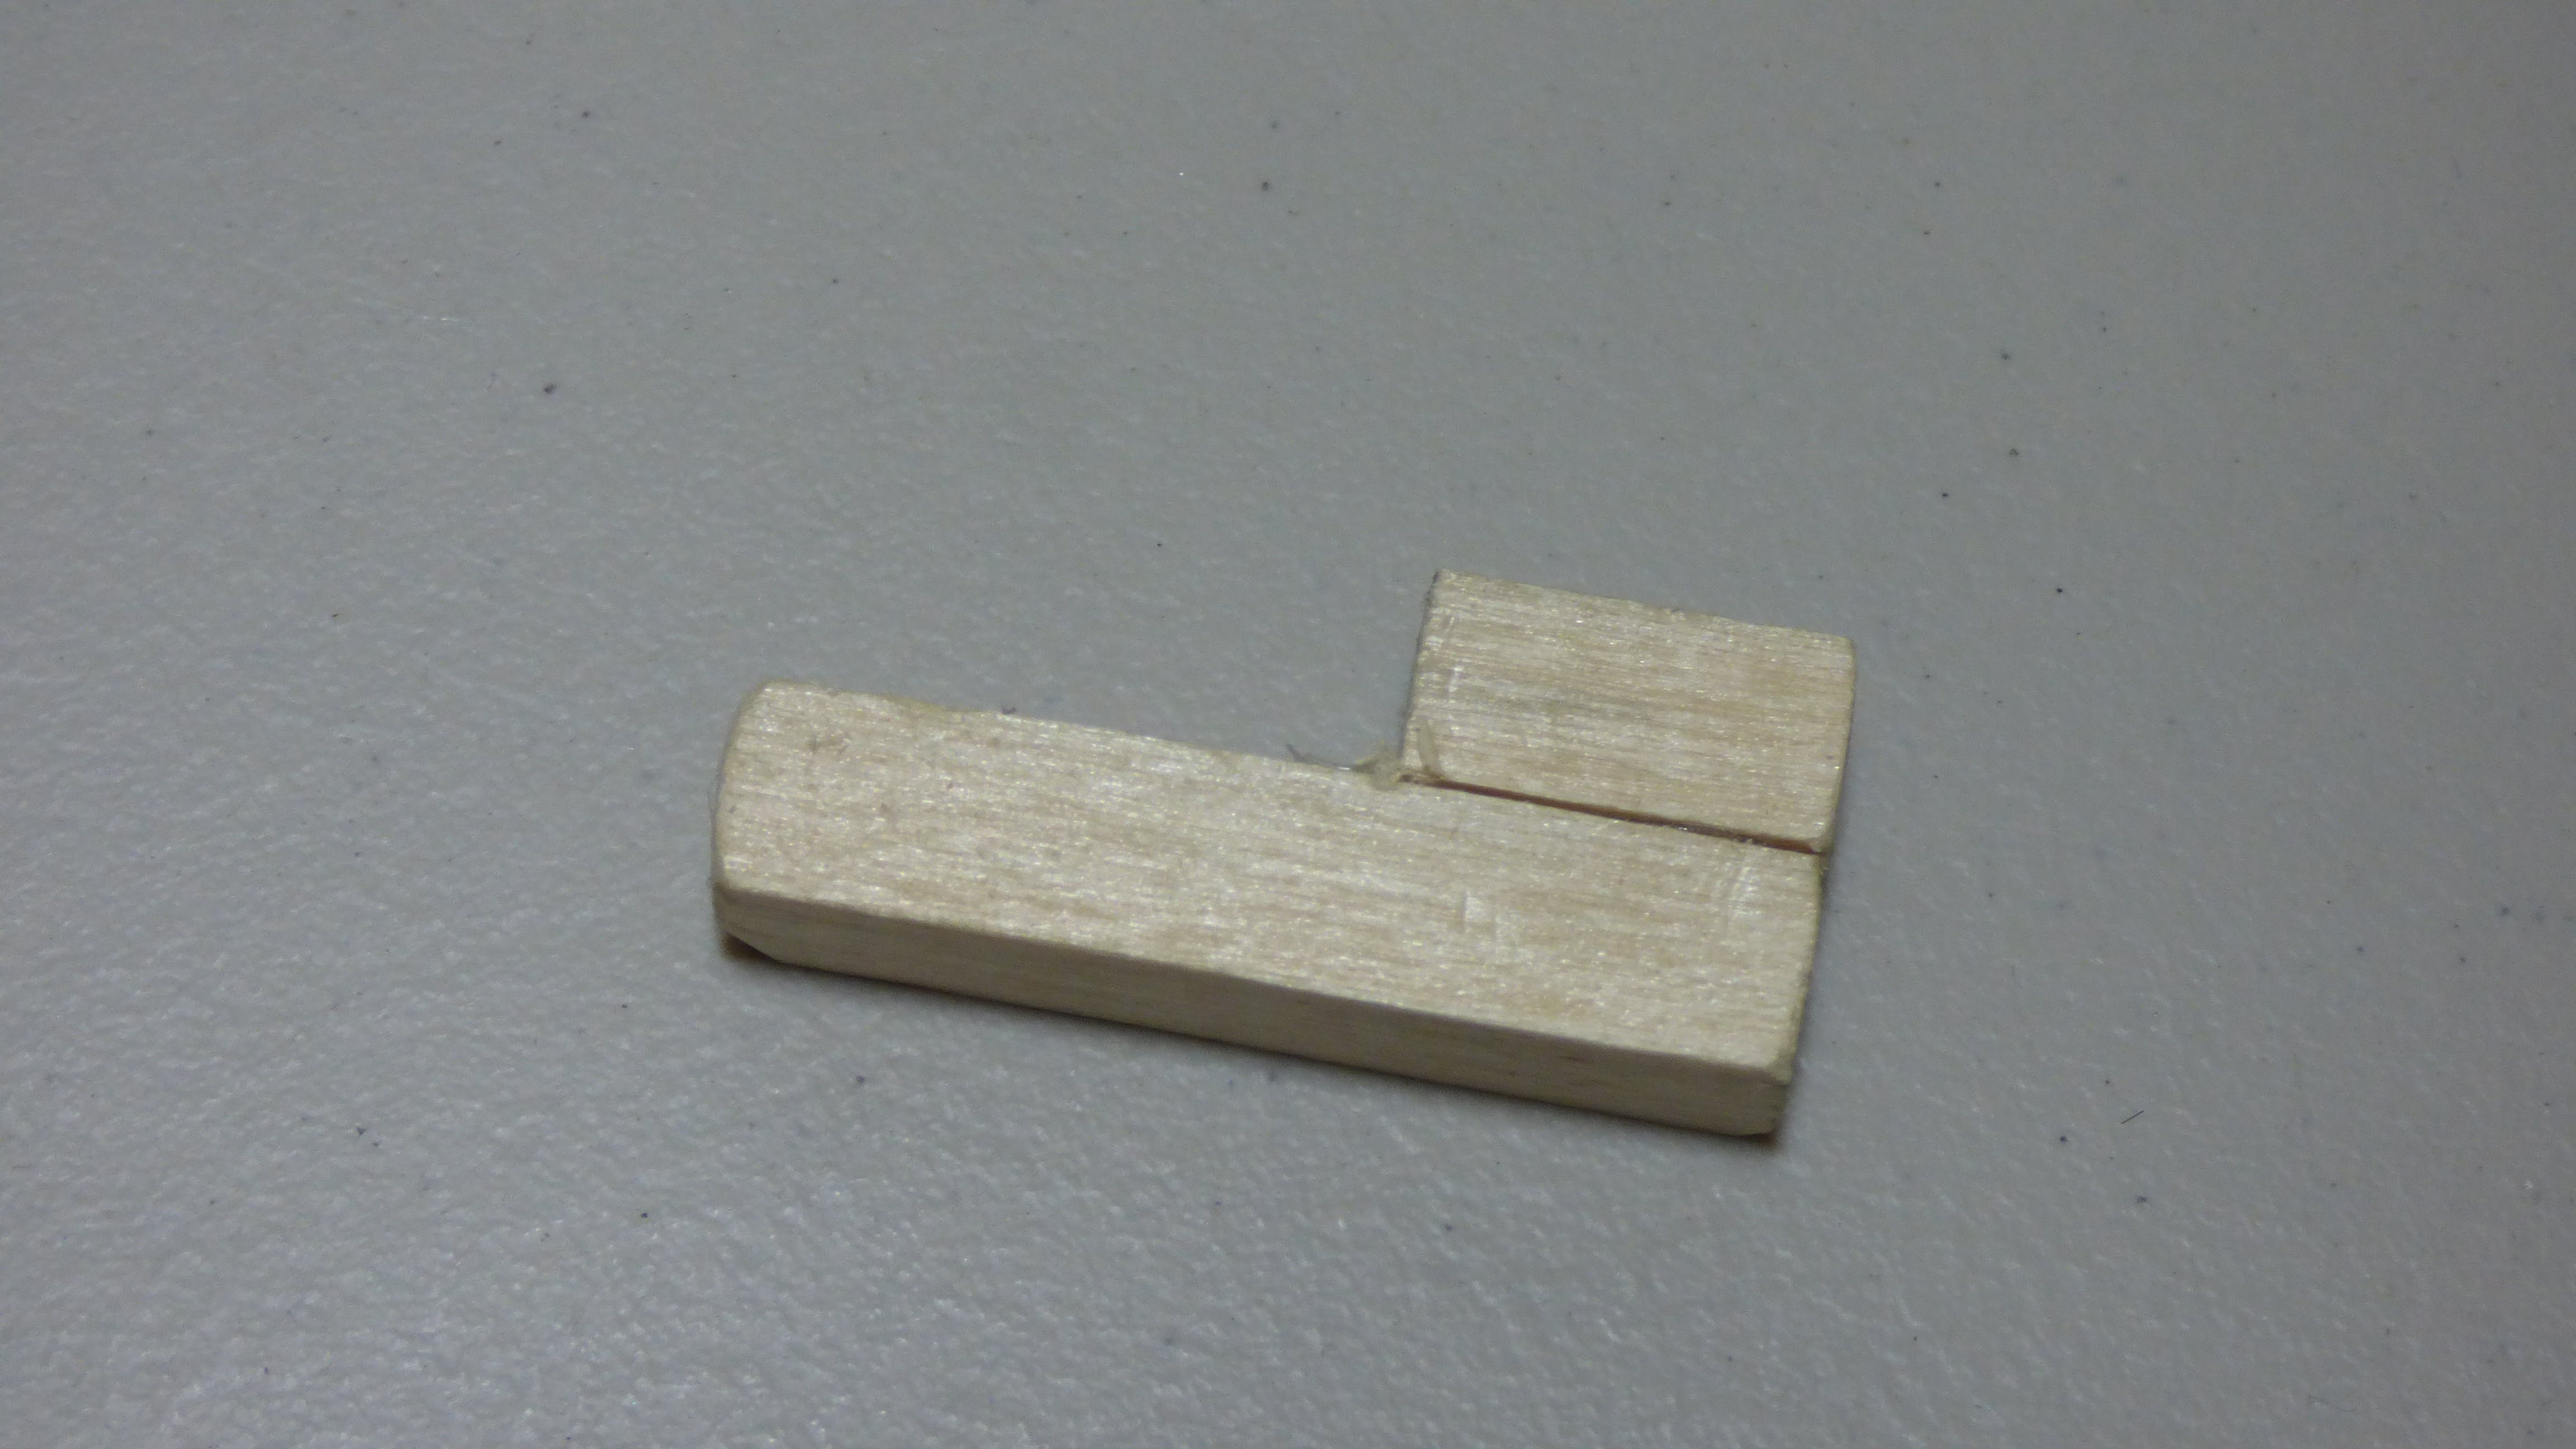 Wooden Spacer